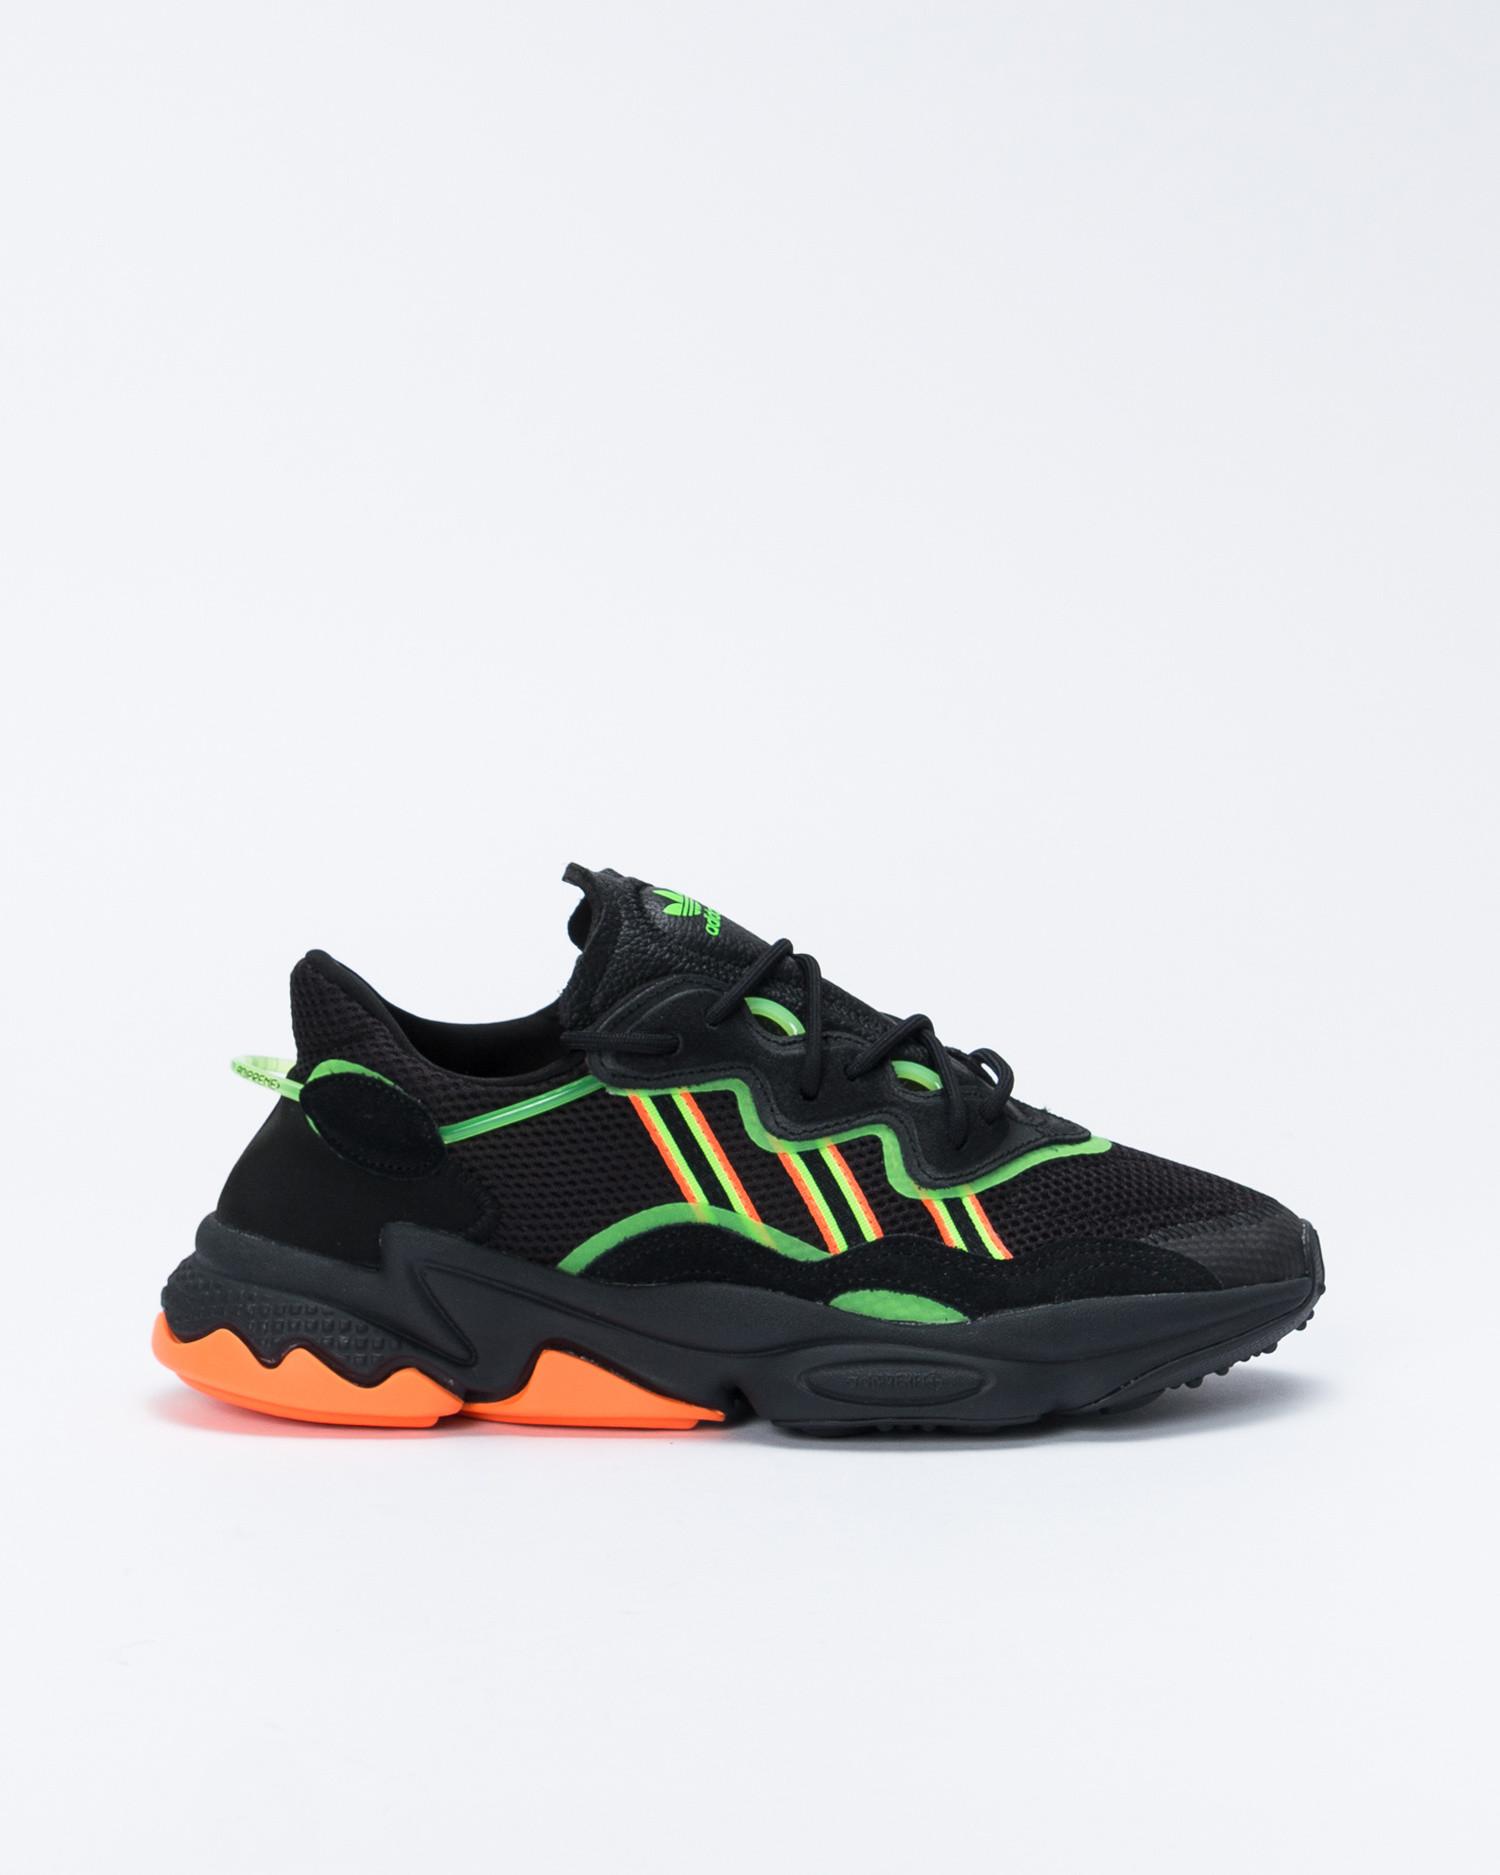 adidas Ozweego Core Black/Solar Green/Hi-res Coral